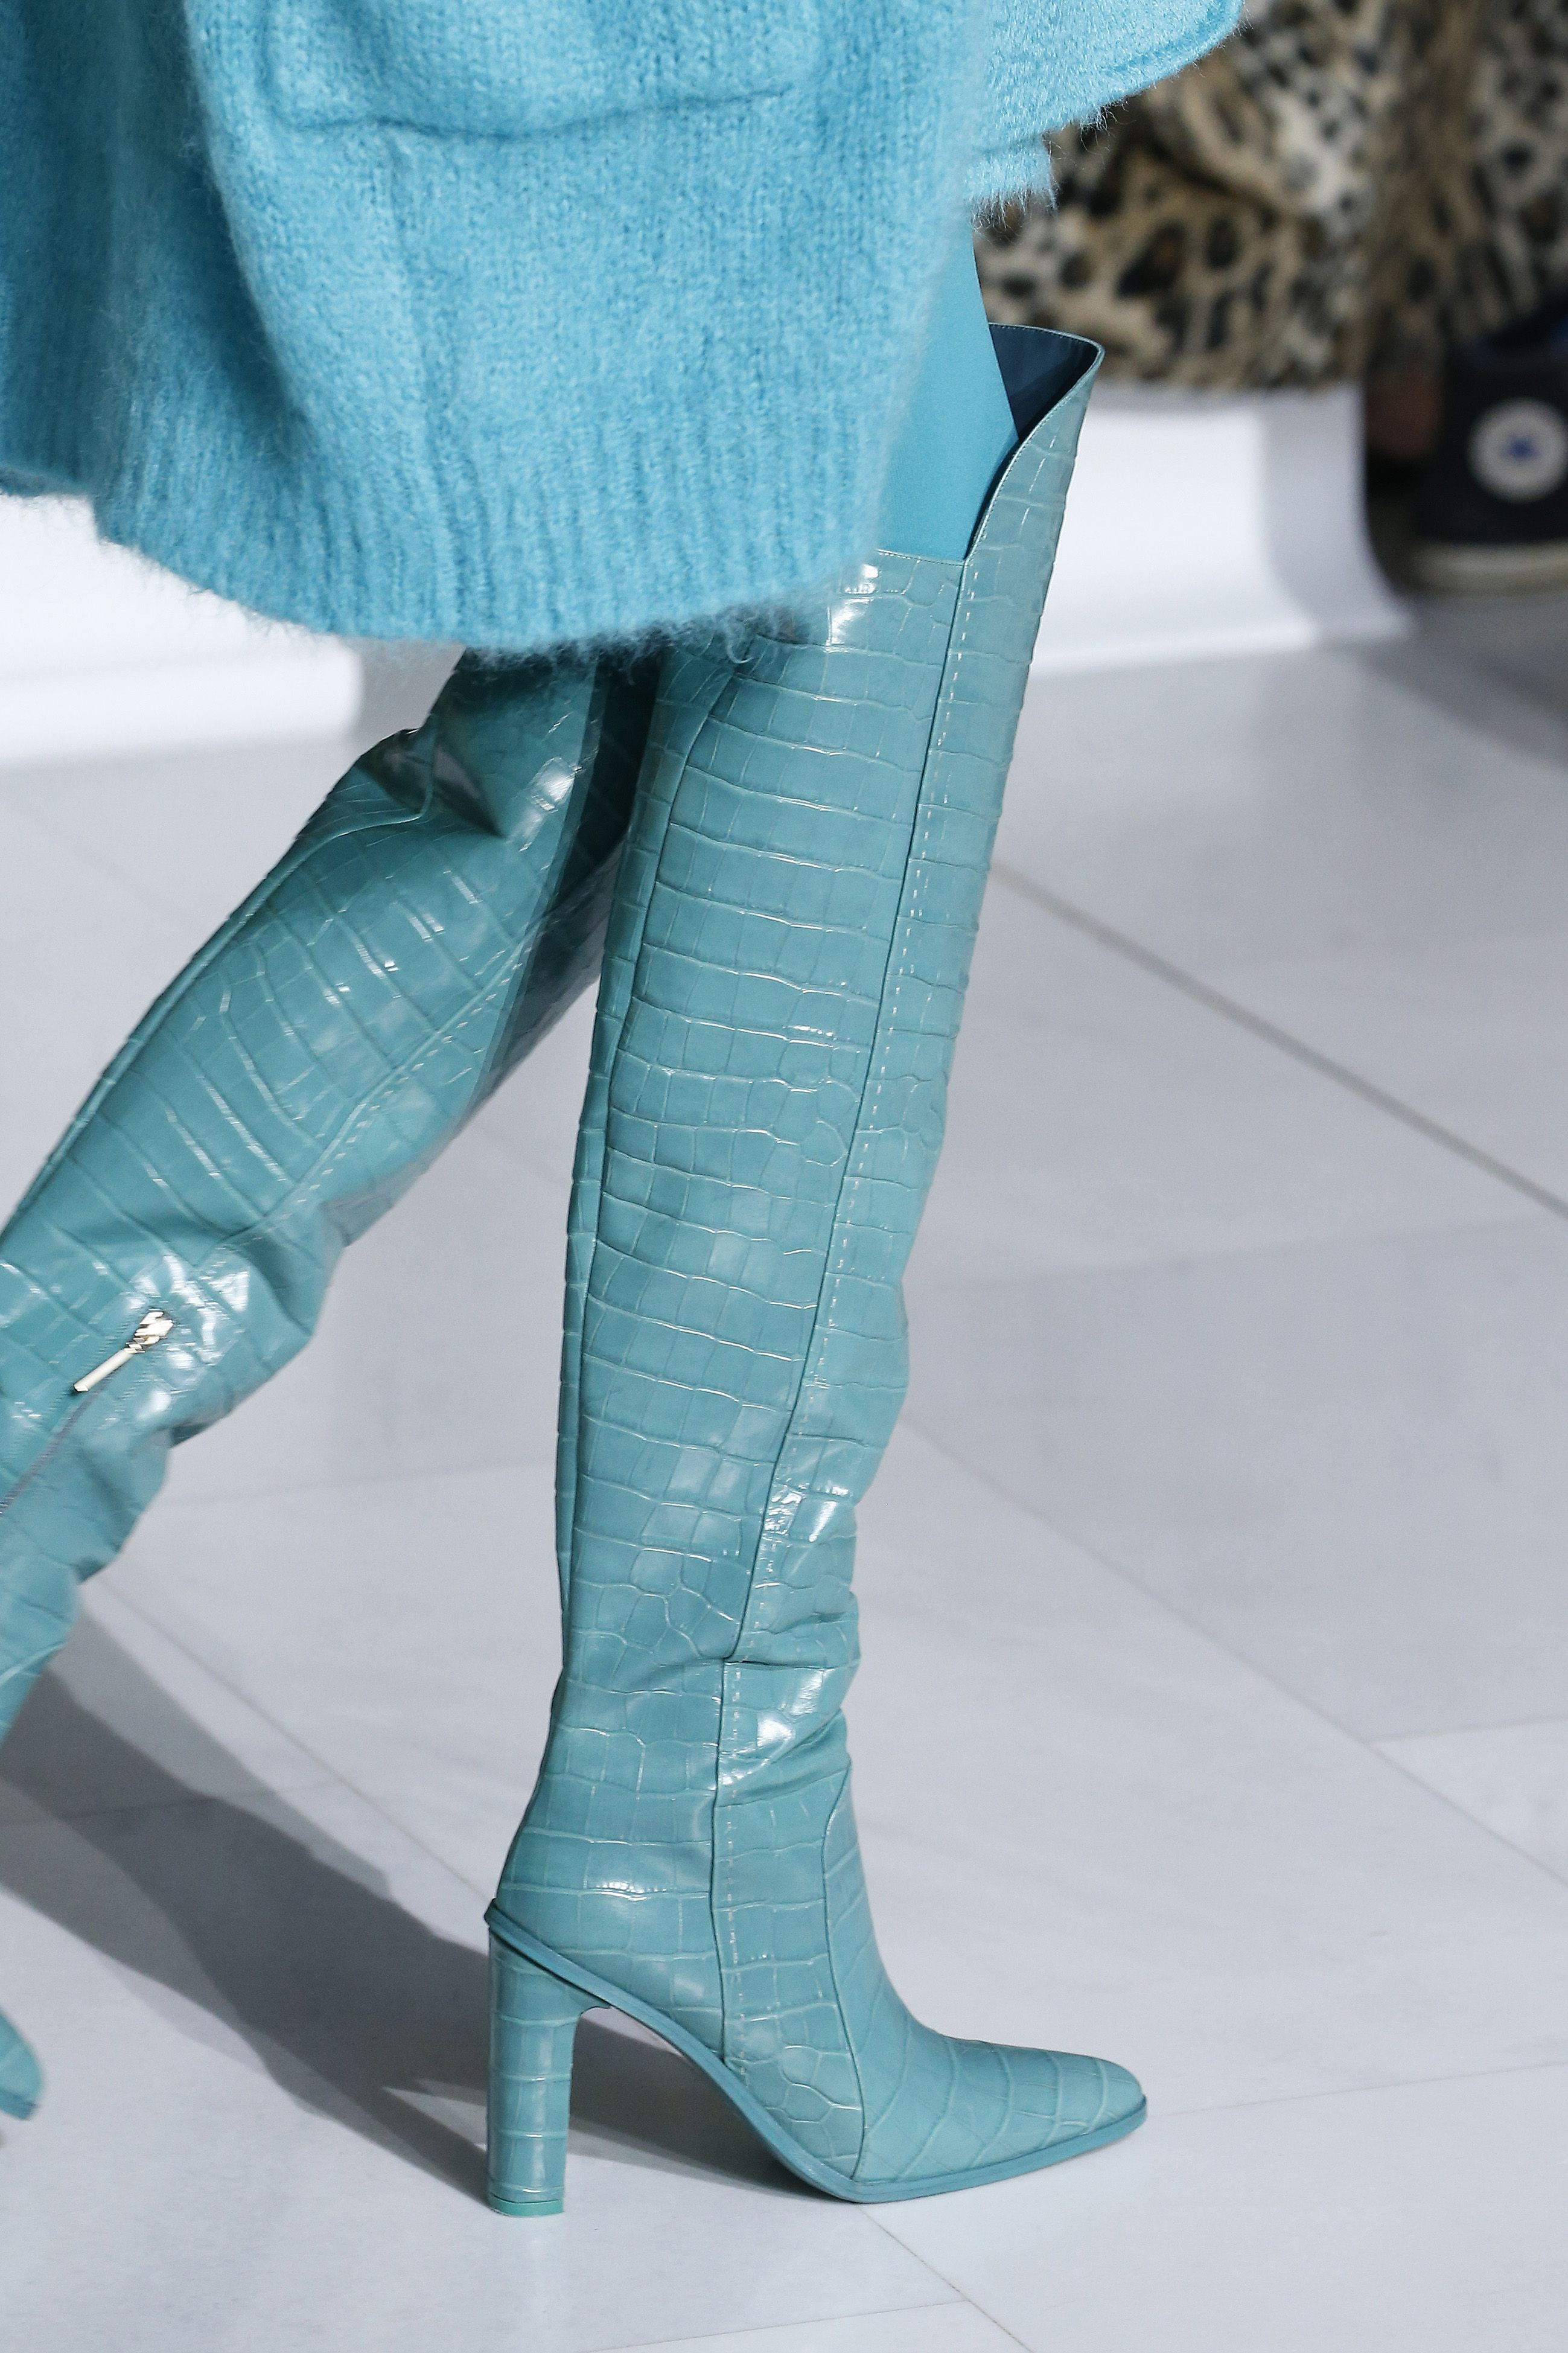 Max Mara - Details: Milan Fashion Week Autumn/Winter 2019/20